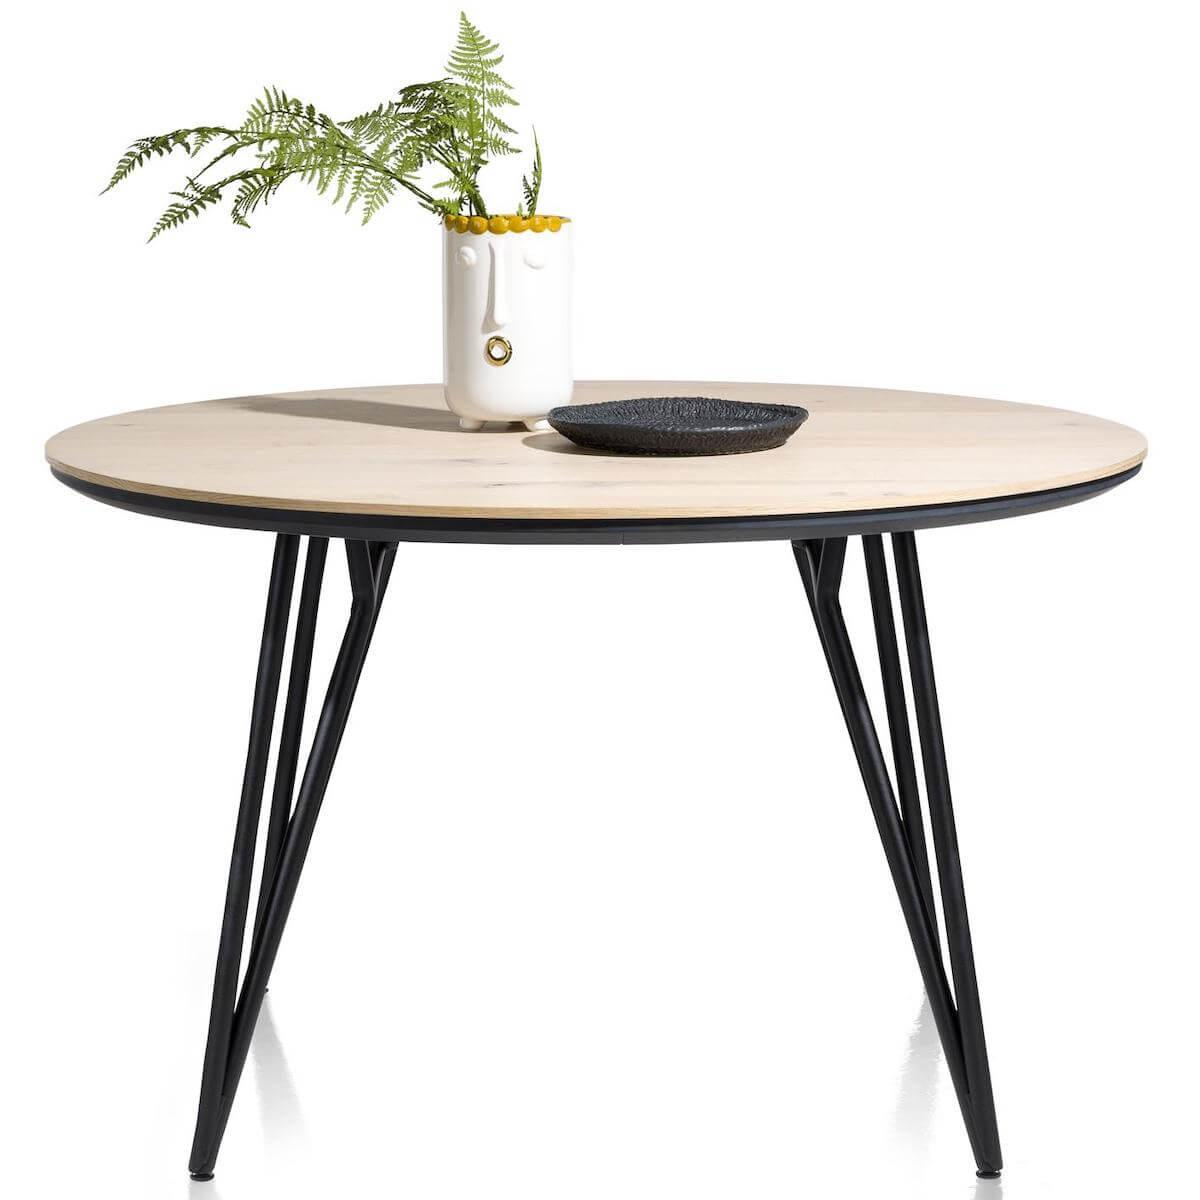 Table ronde 130cm VIK Xooon